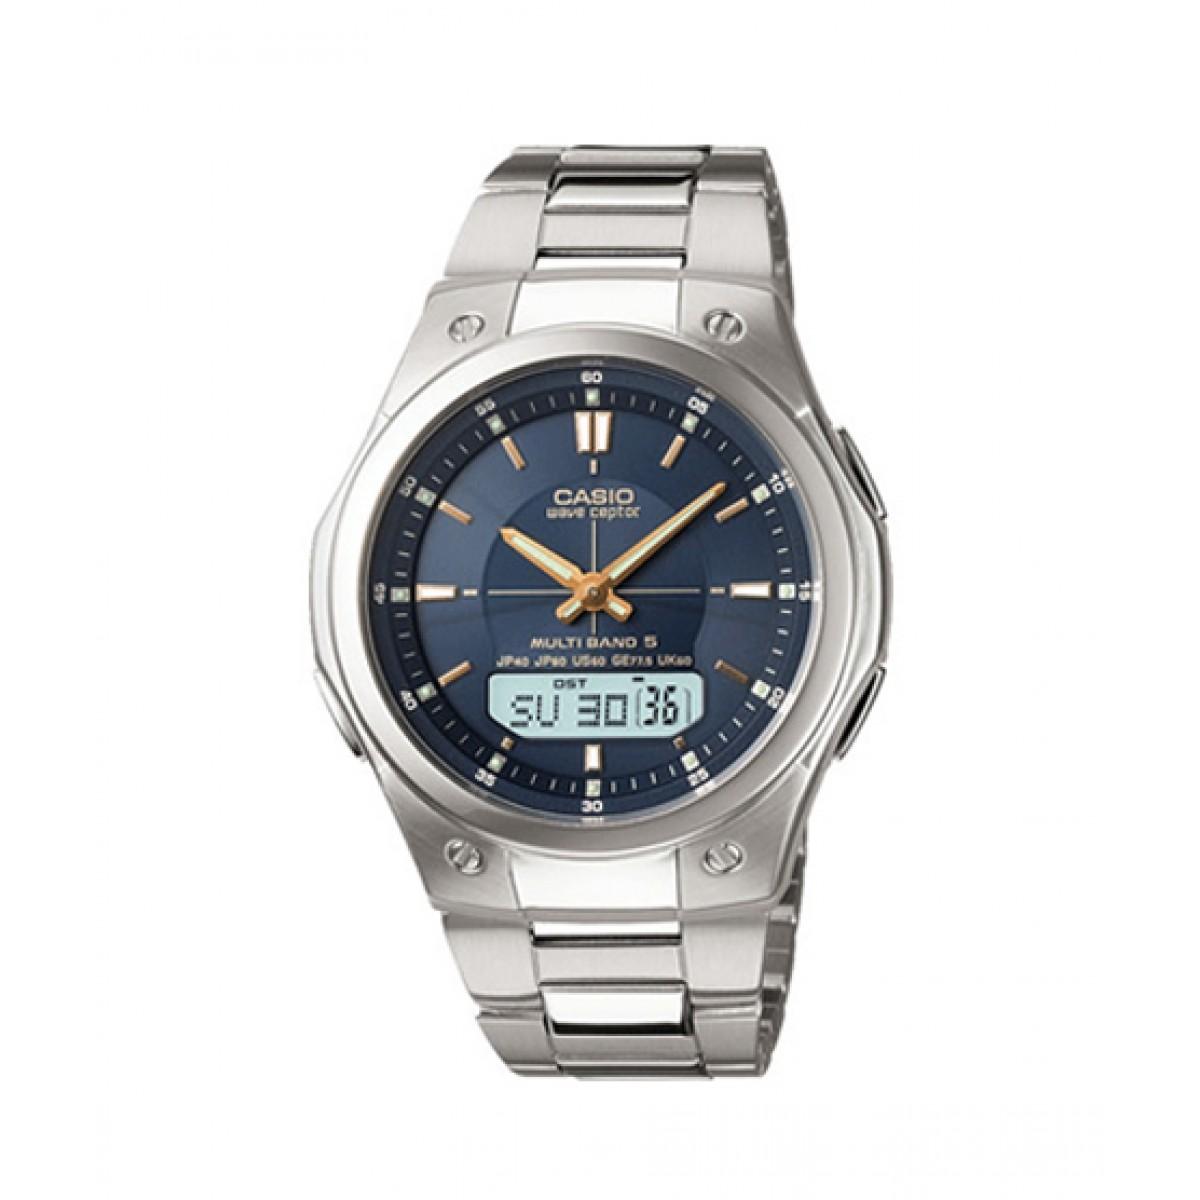 9ddb9b9f24a1 Casio Wave Ceptor Men s Watch Price in Pakistan